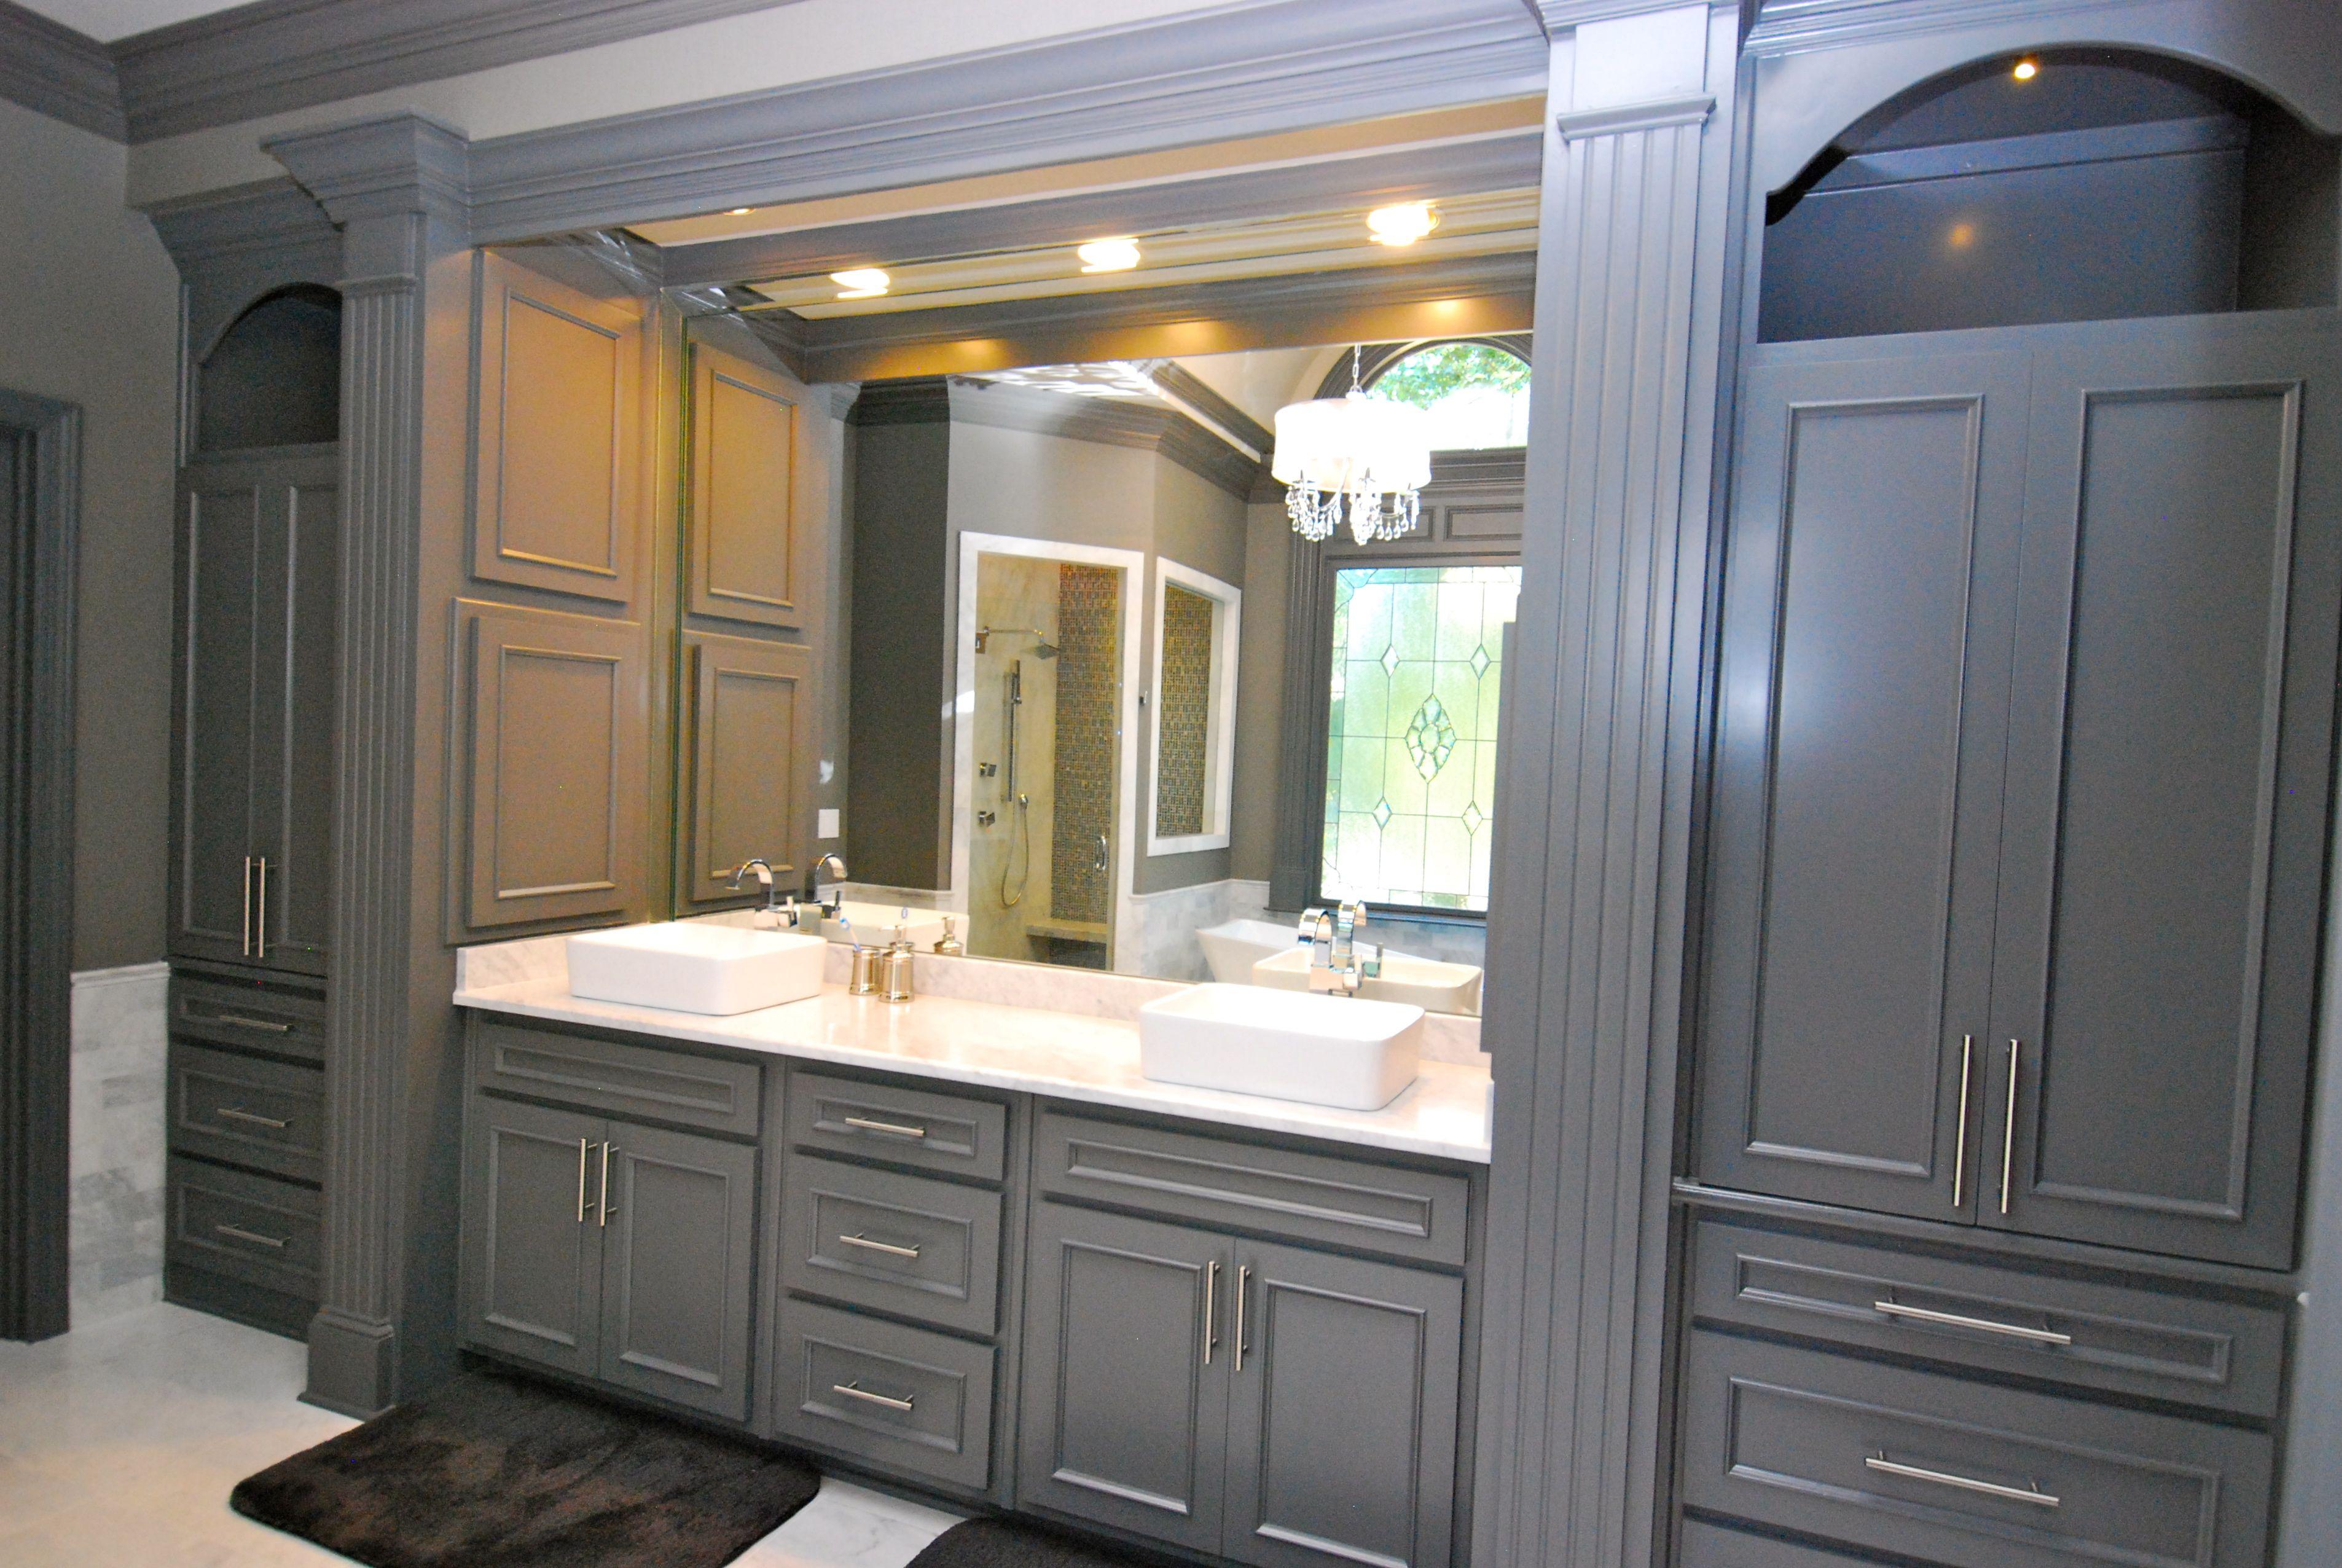 Remodeling Gallery | Atlanta Custom Home Builder - Santoro Signature Homes